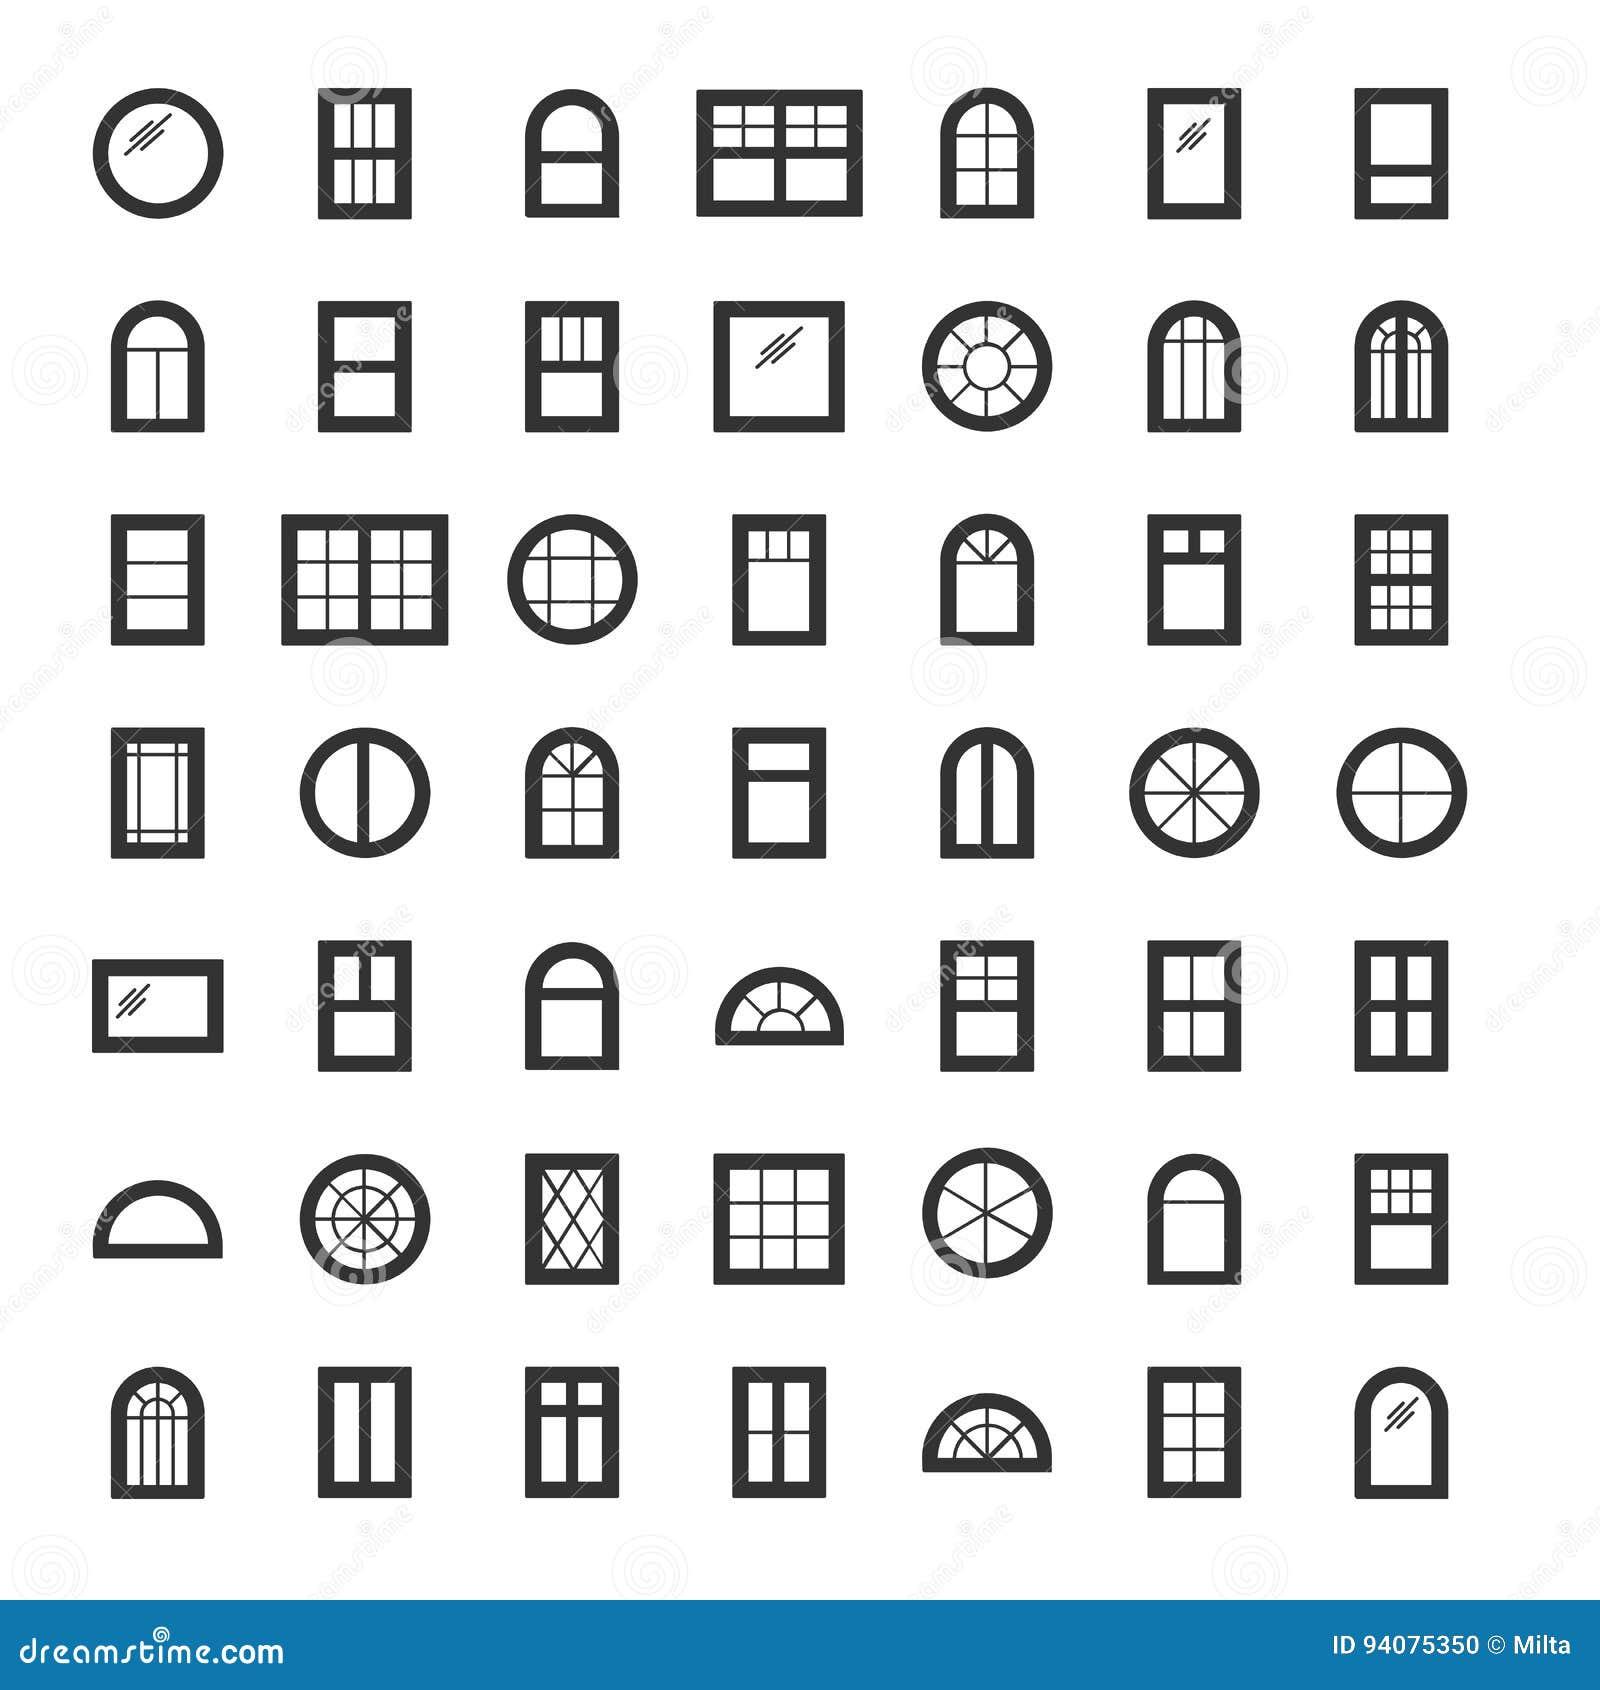 windows icon collection set of line window contours